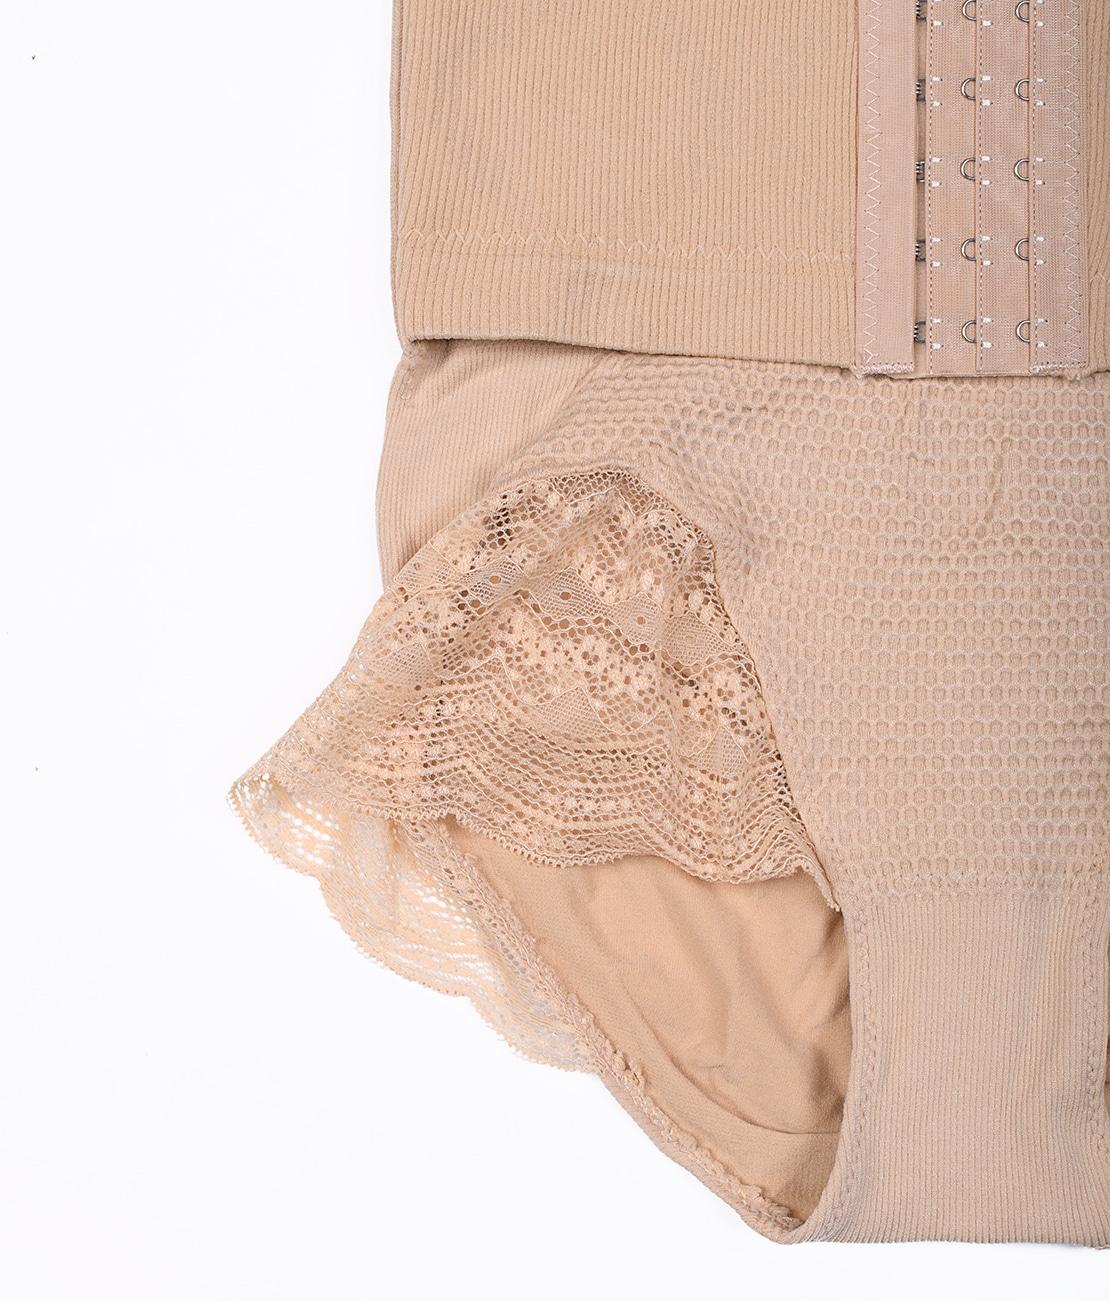 Culotte Push Up Beige Packshot Detail 1